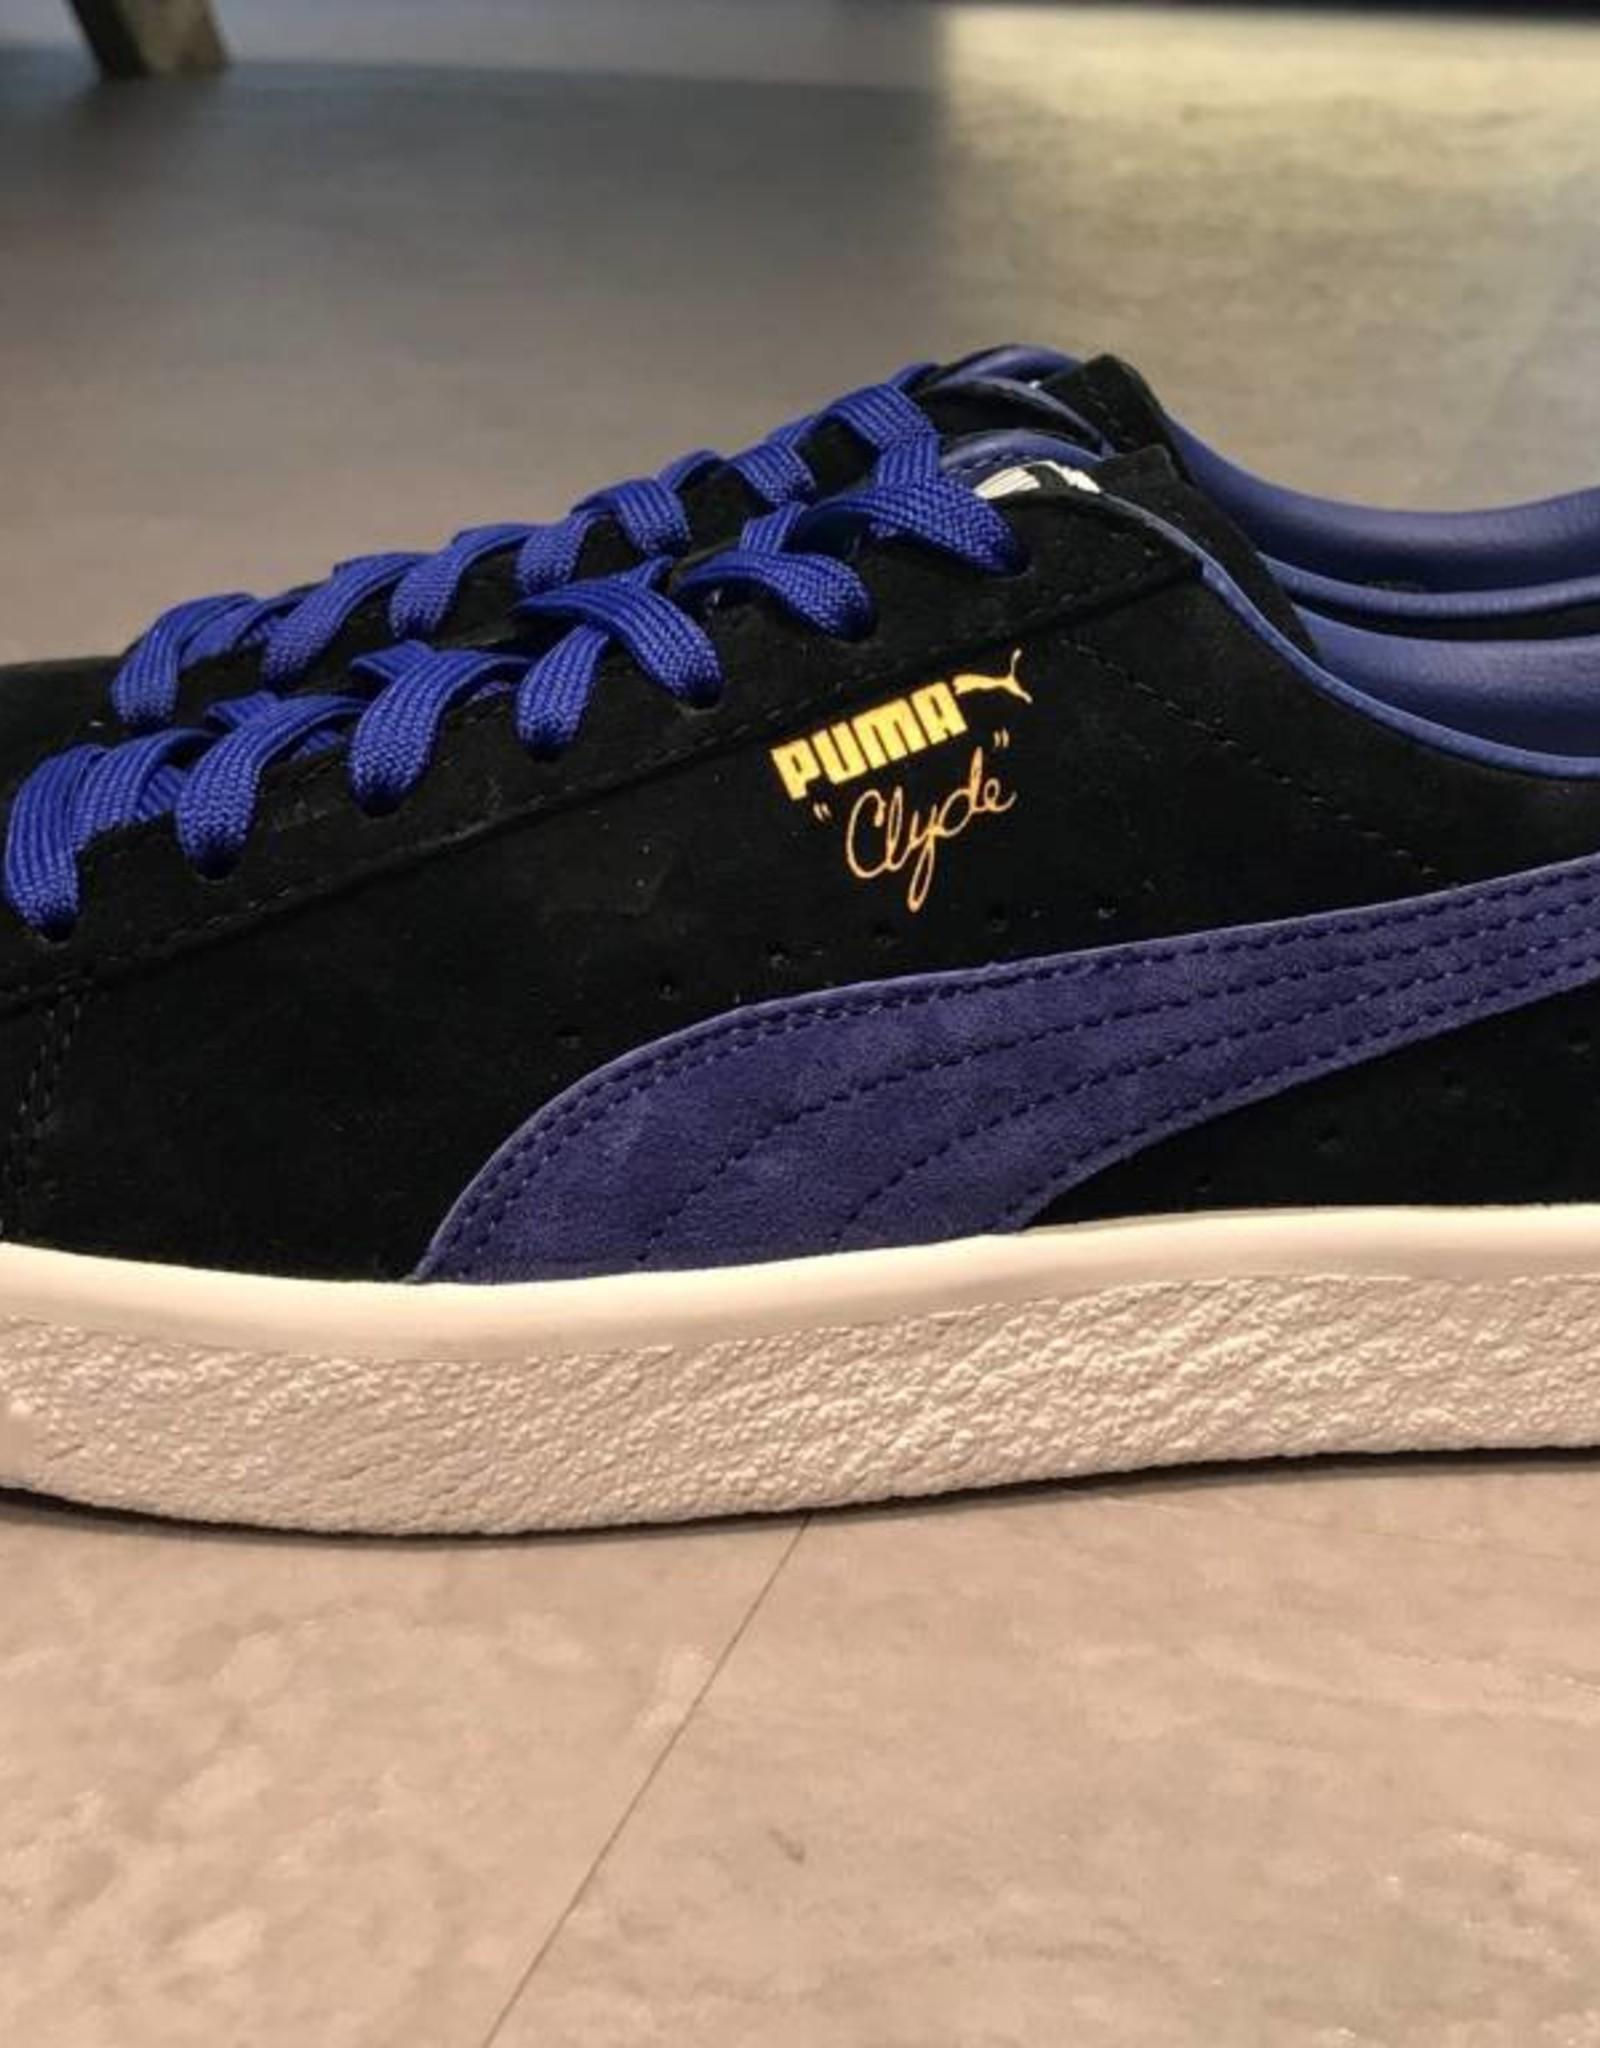 Puma Puma Clyde Black / Electric blue